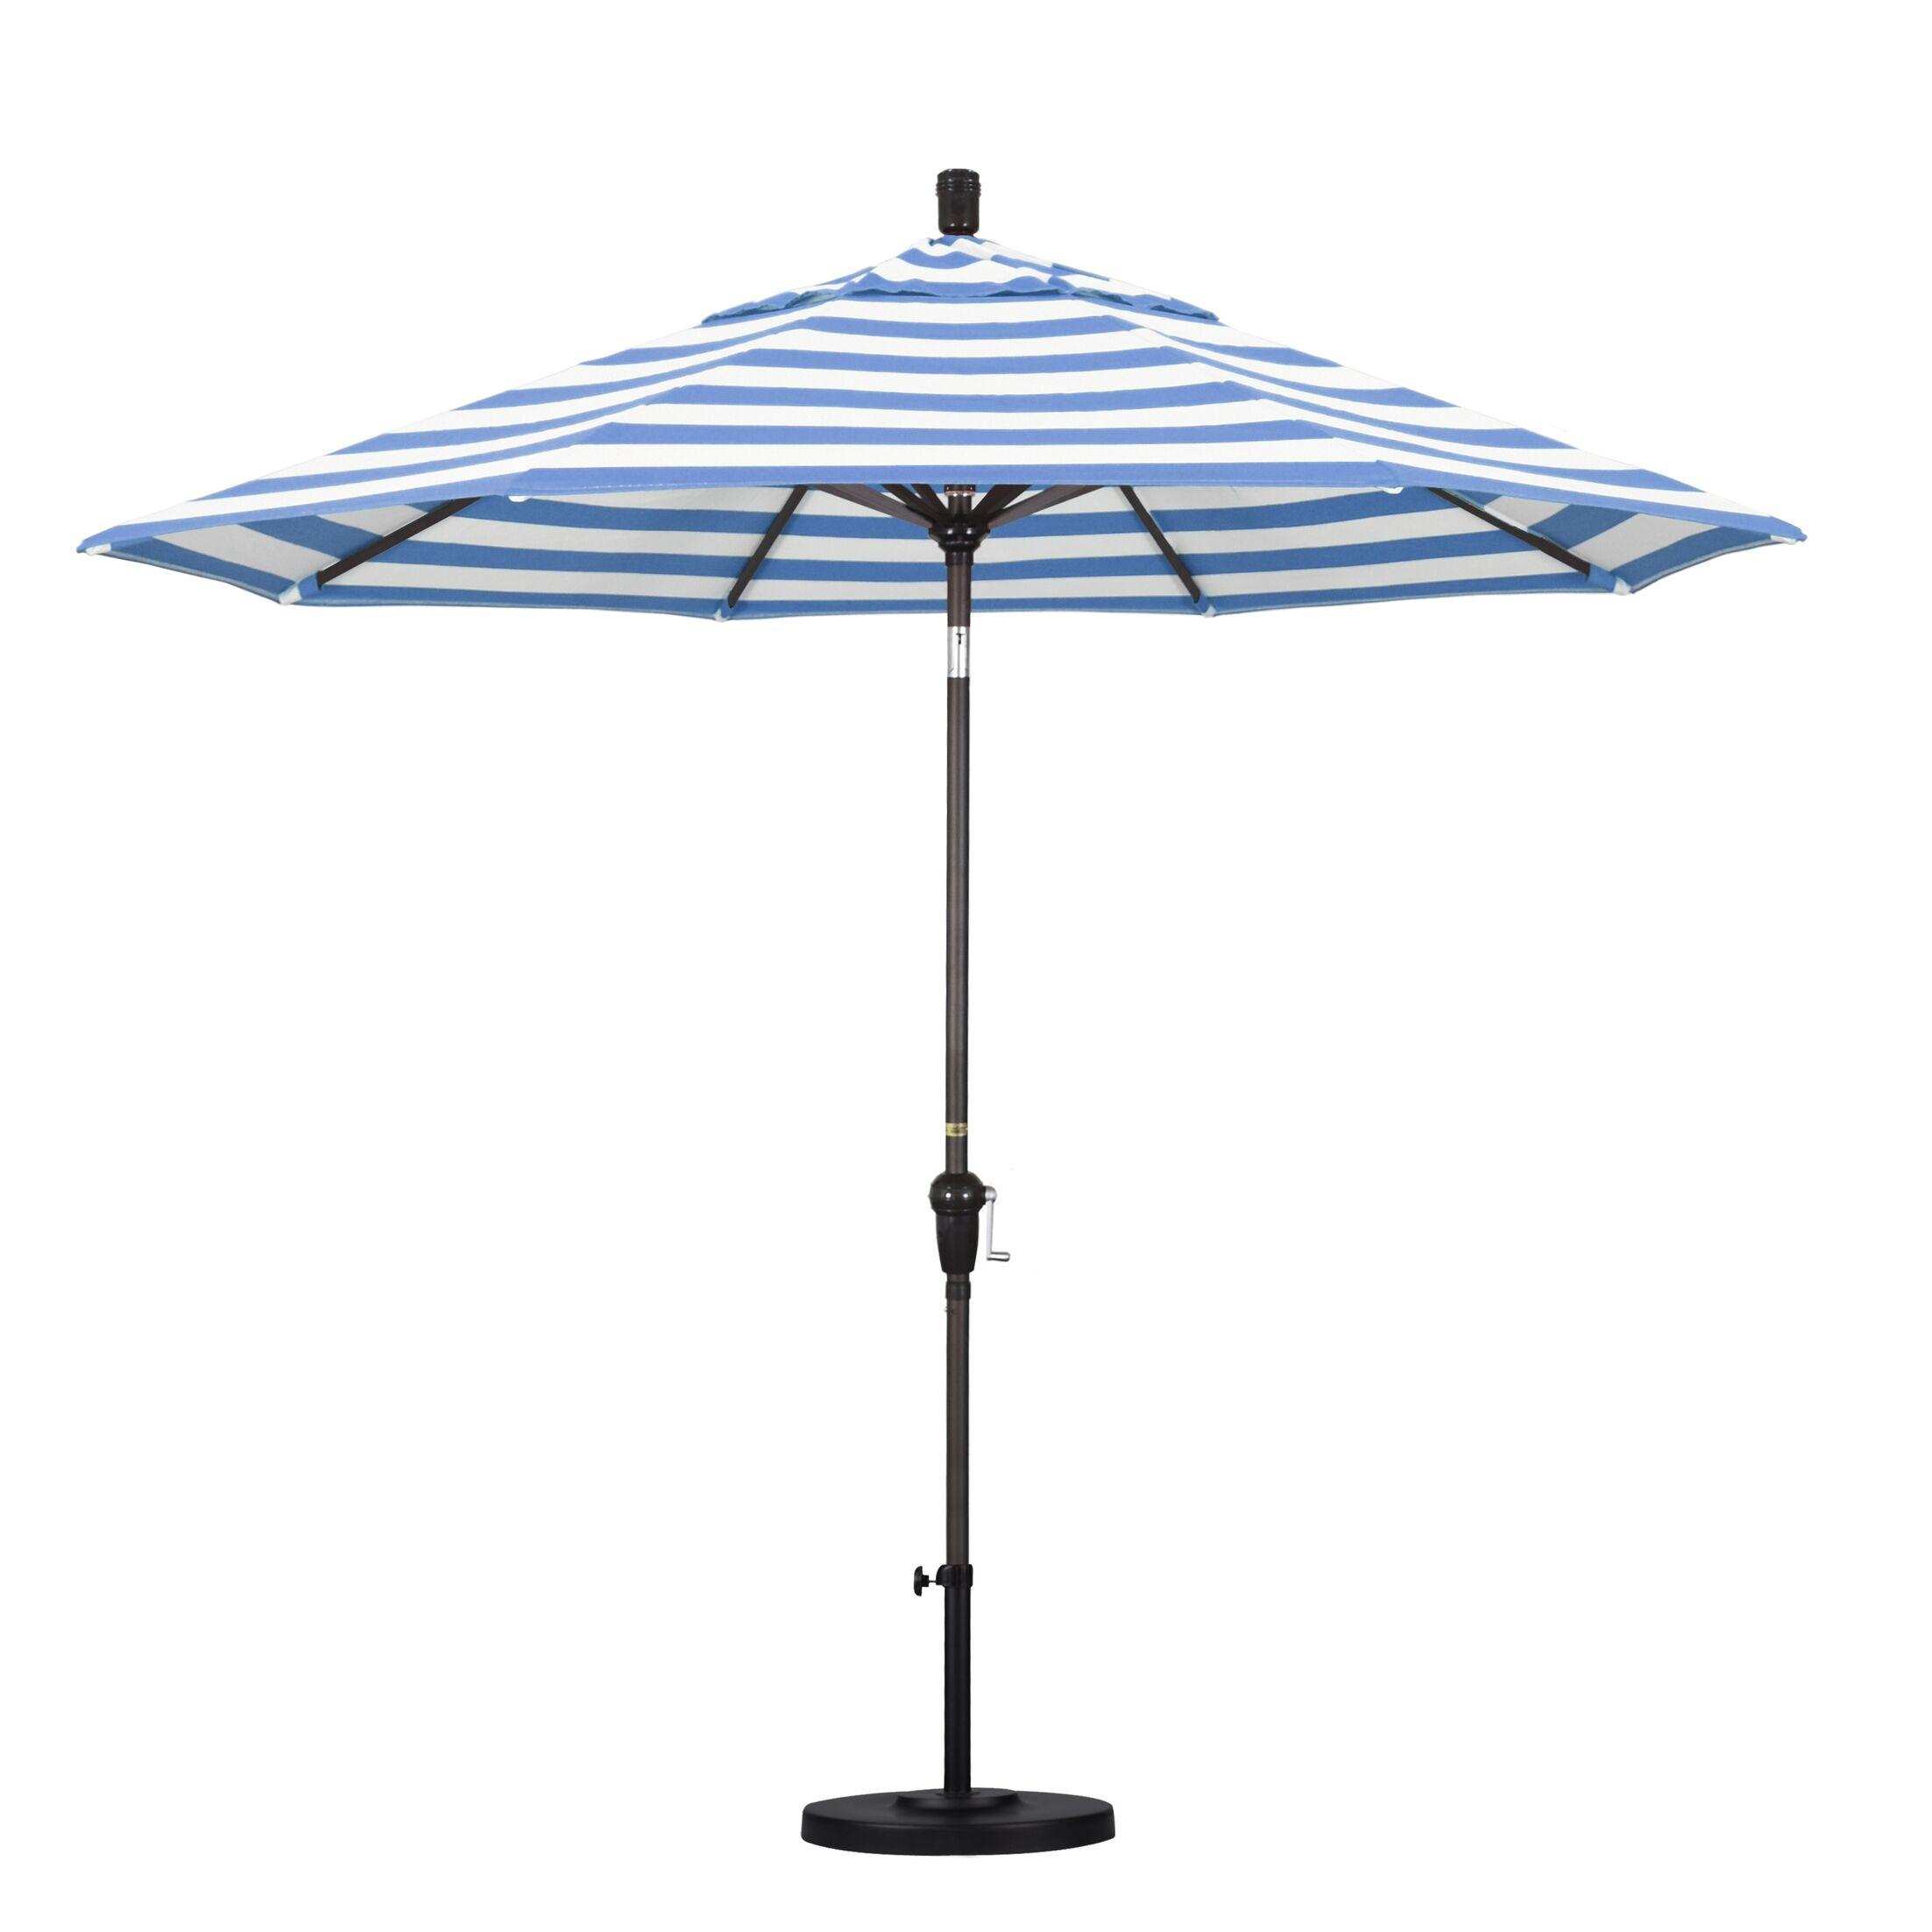 8.5' Market Umbrella Fabric Color: Regatta, Frame Color: Bronze